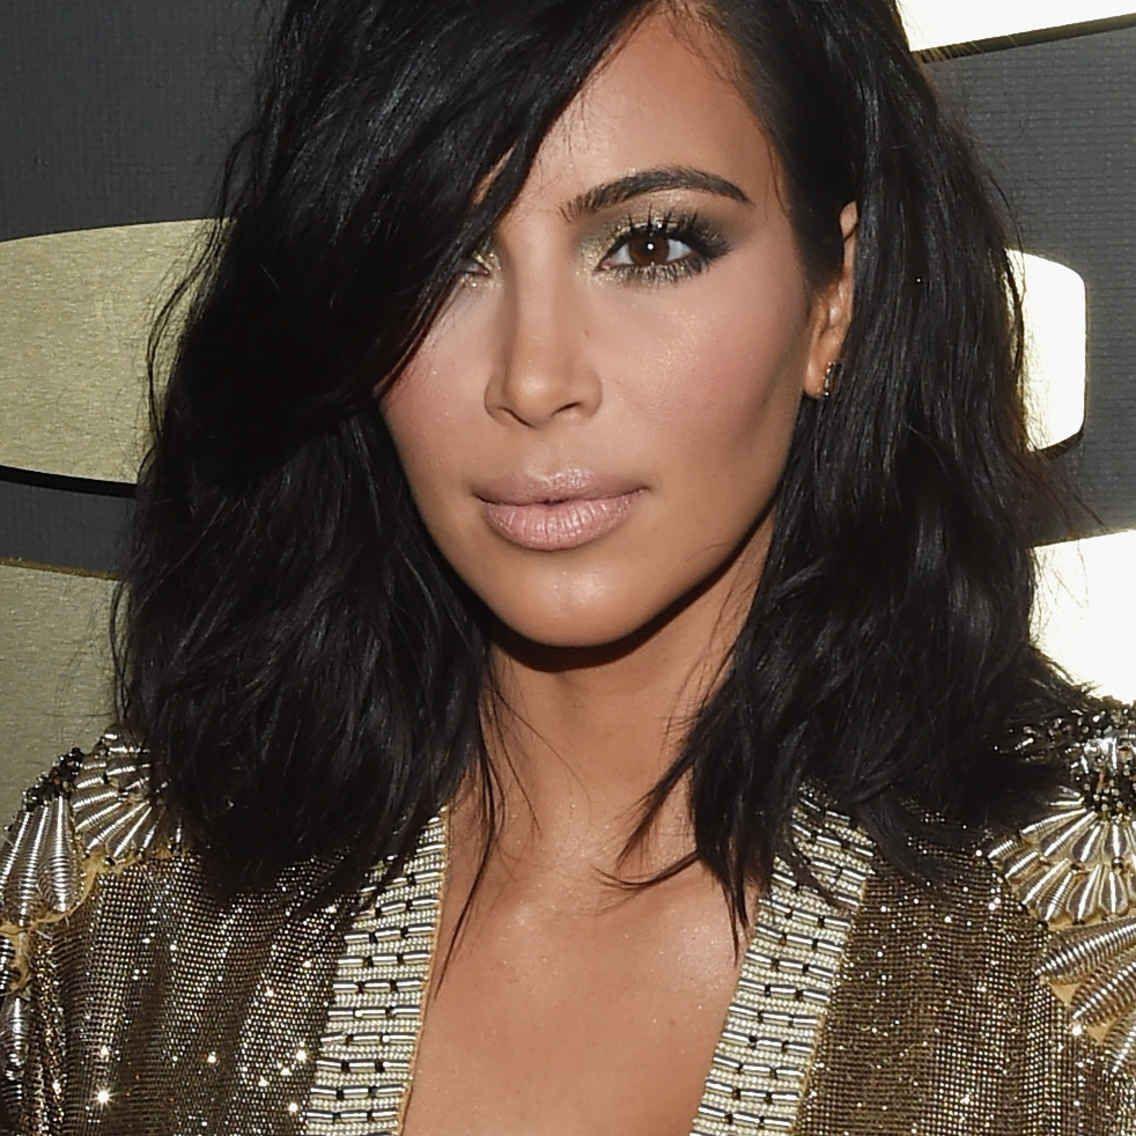 Kim Kardashians Hair Stylist Tells Us About That New Short Cut